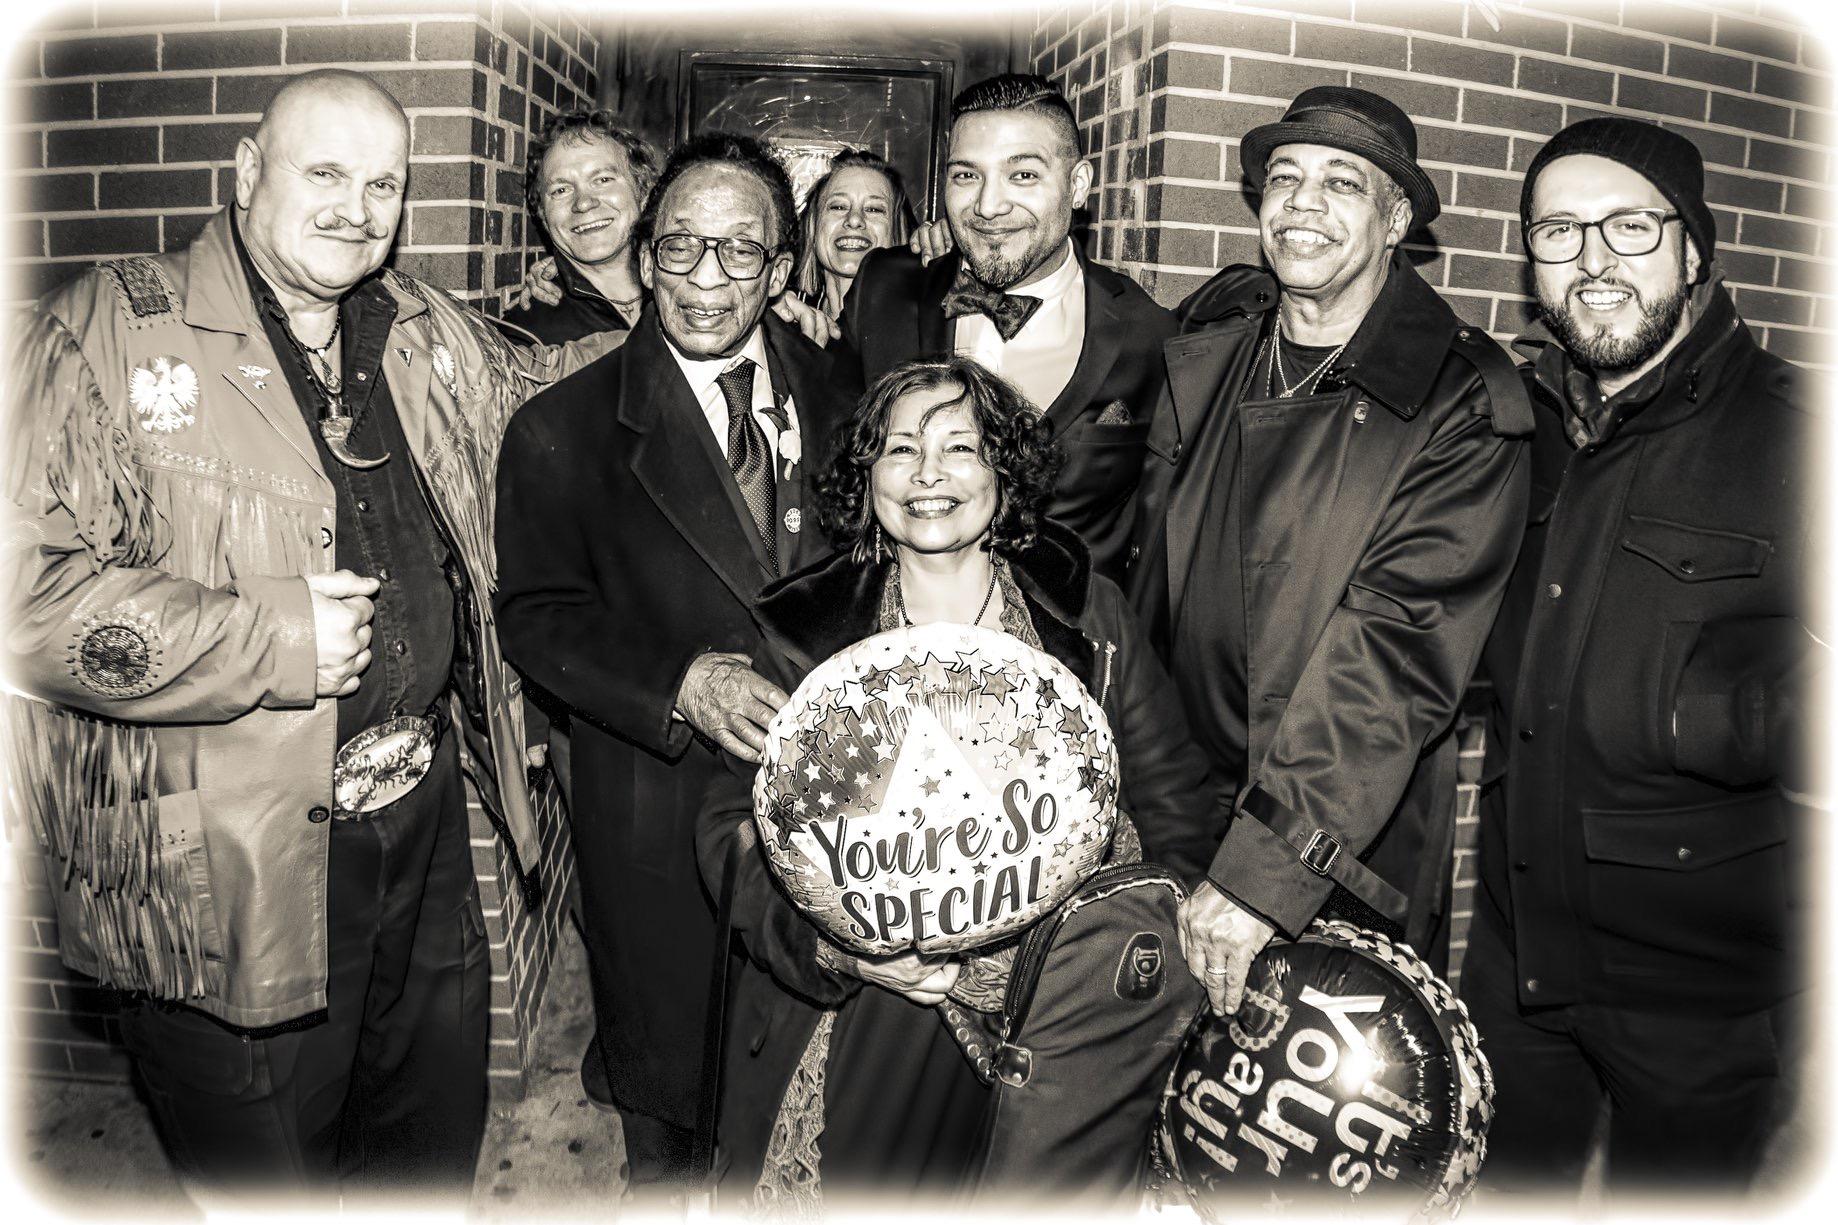 w/ Big Al, Pat Mallinger, George Freeman, Jill Skintges, Rosa Branch, Billy Branch and Juan Pastor